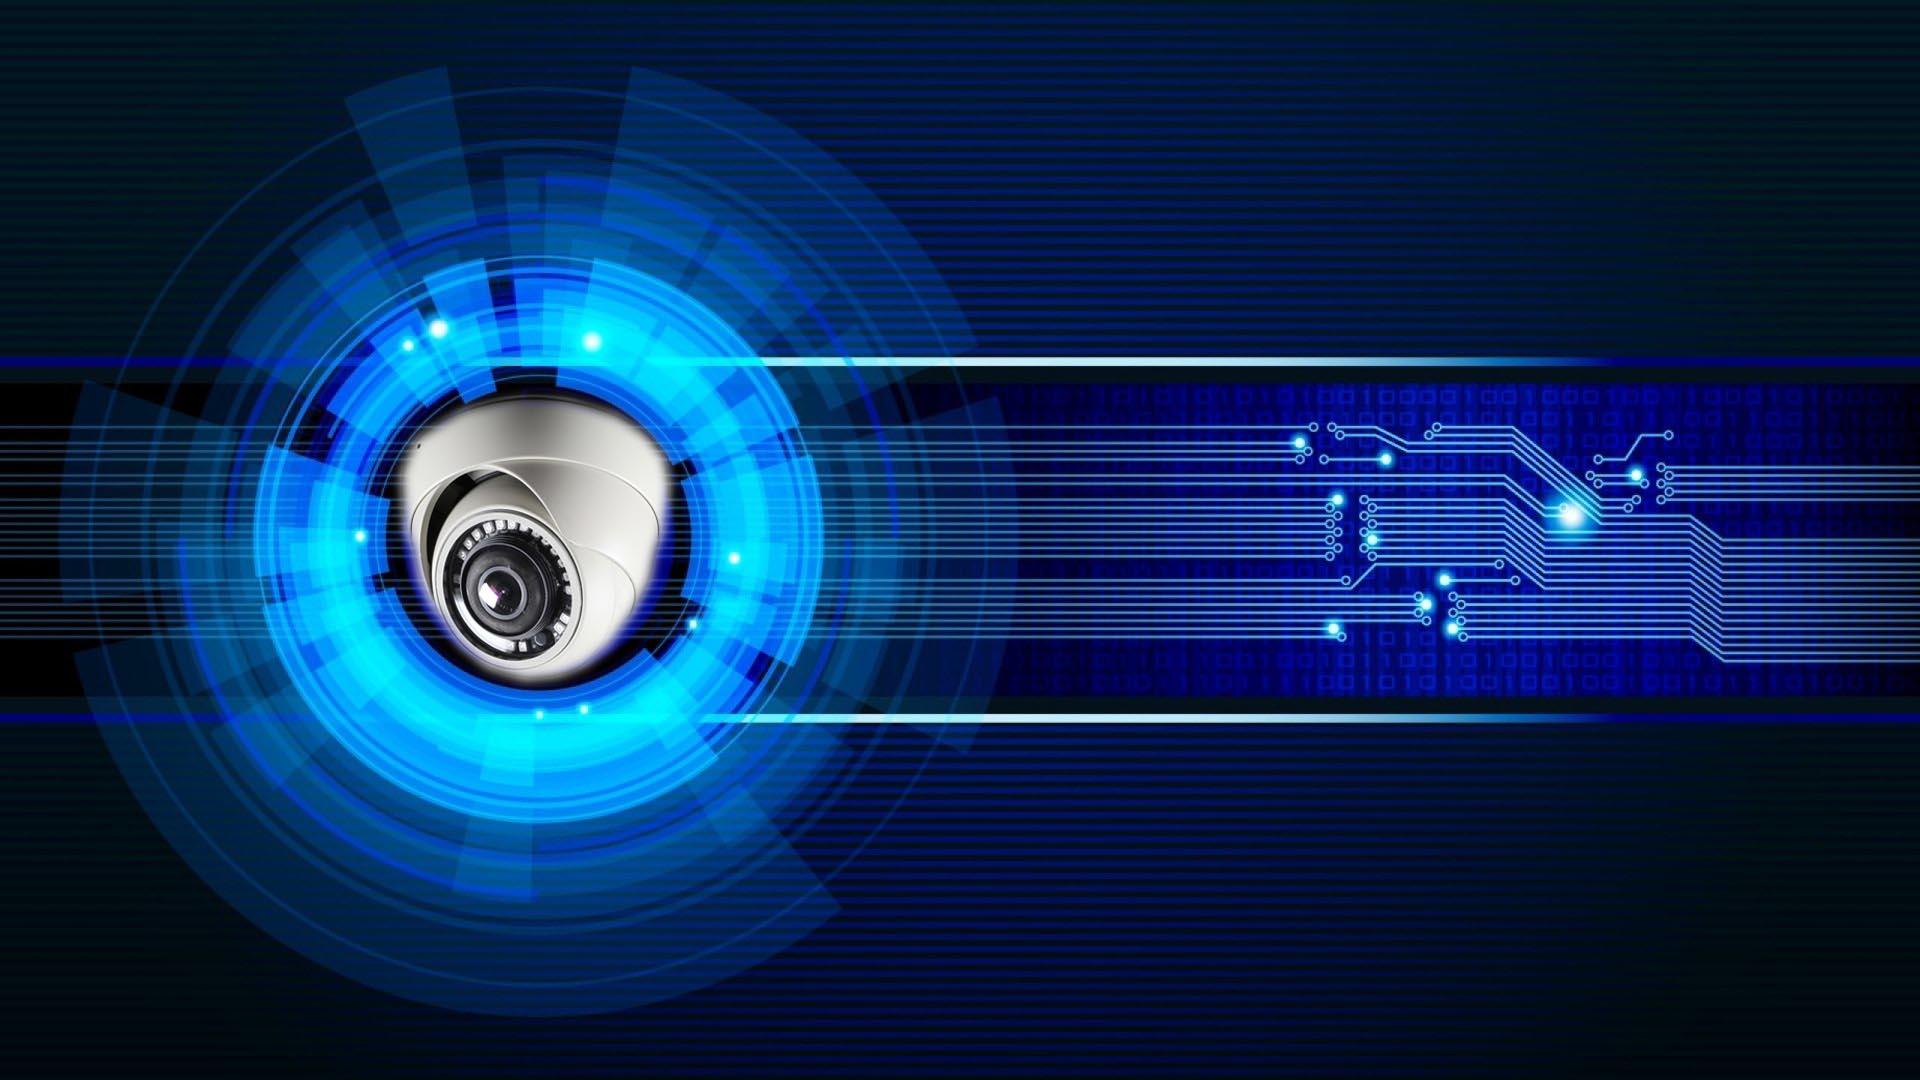 CCTV SURVEILLANCE SYSTEM